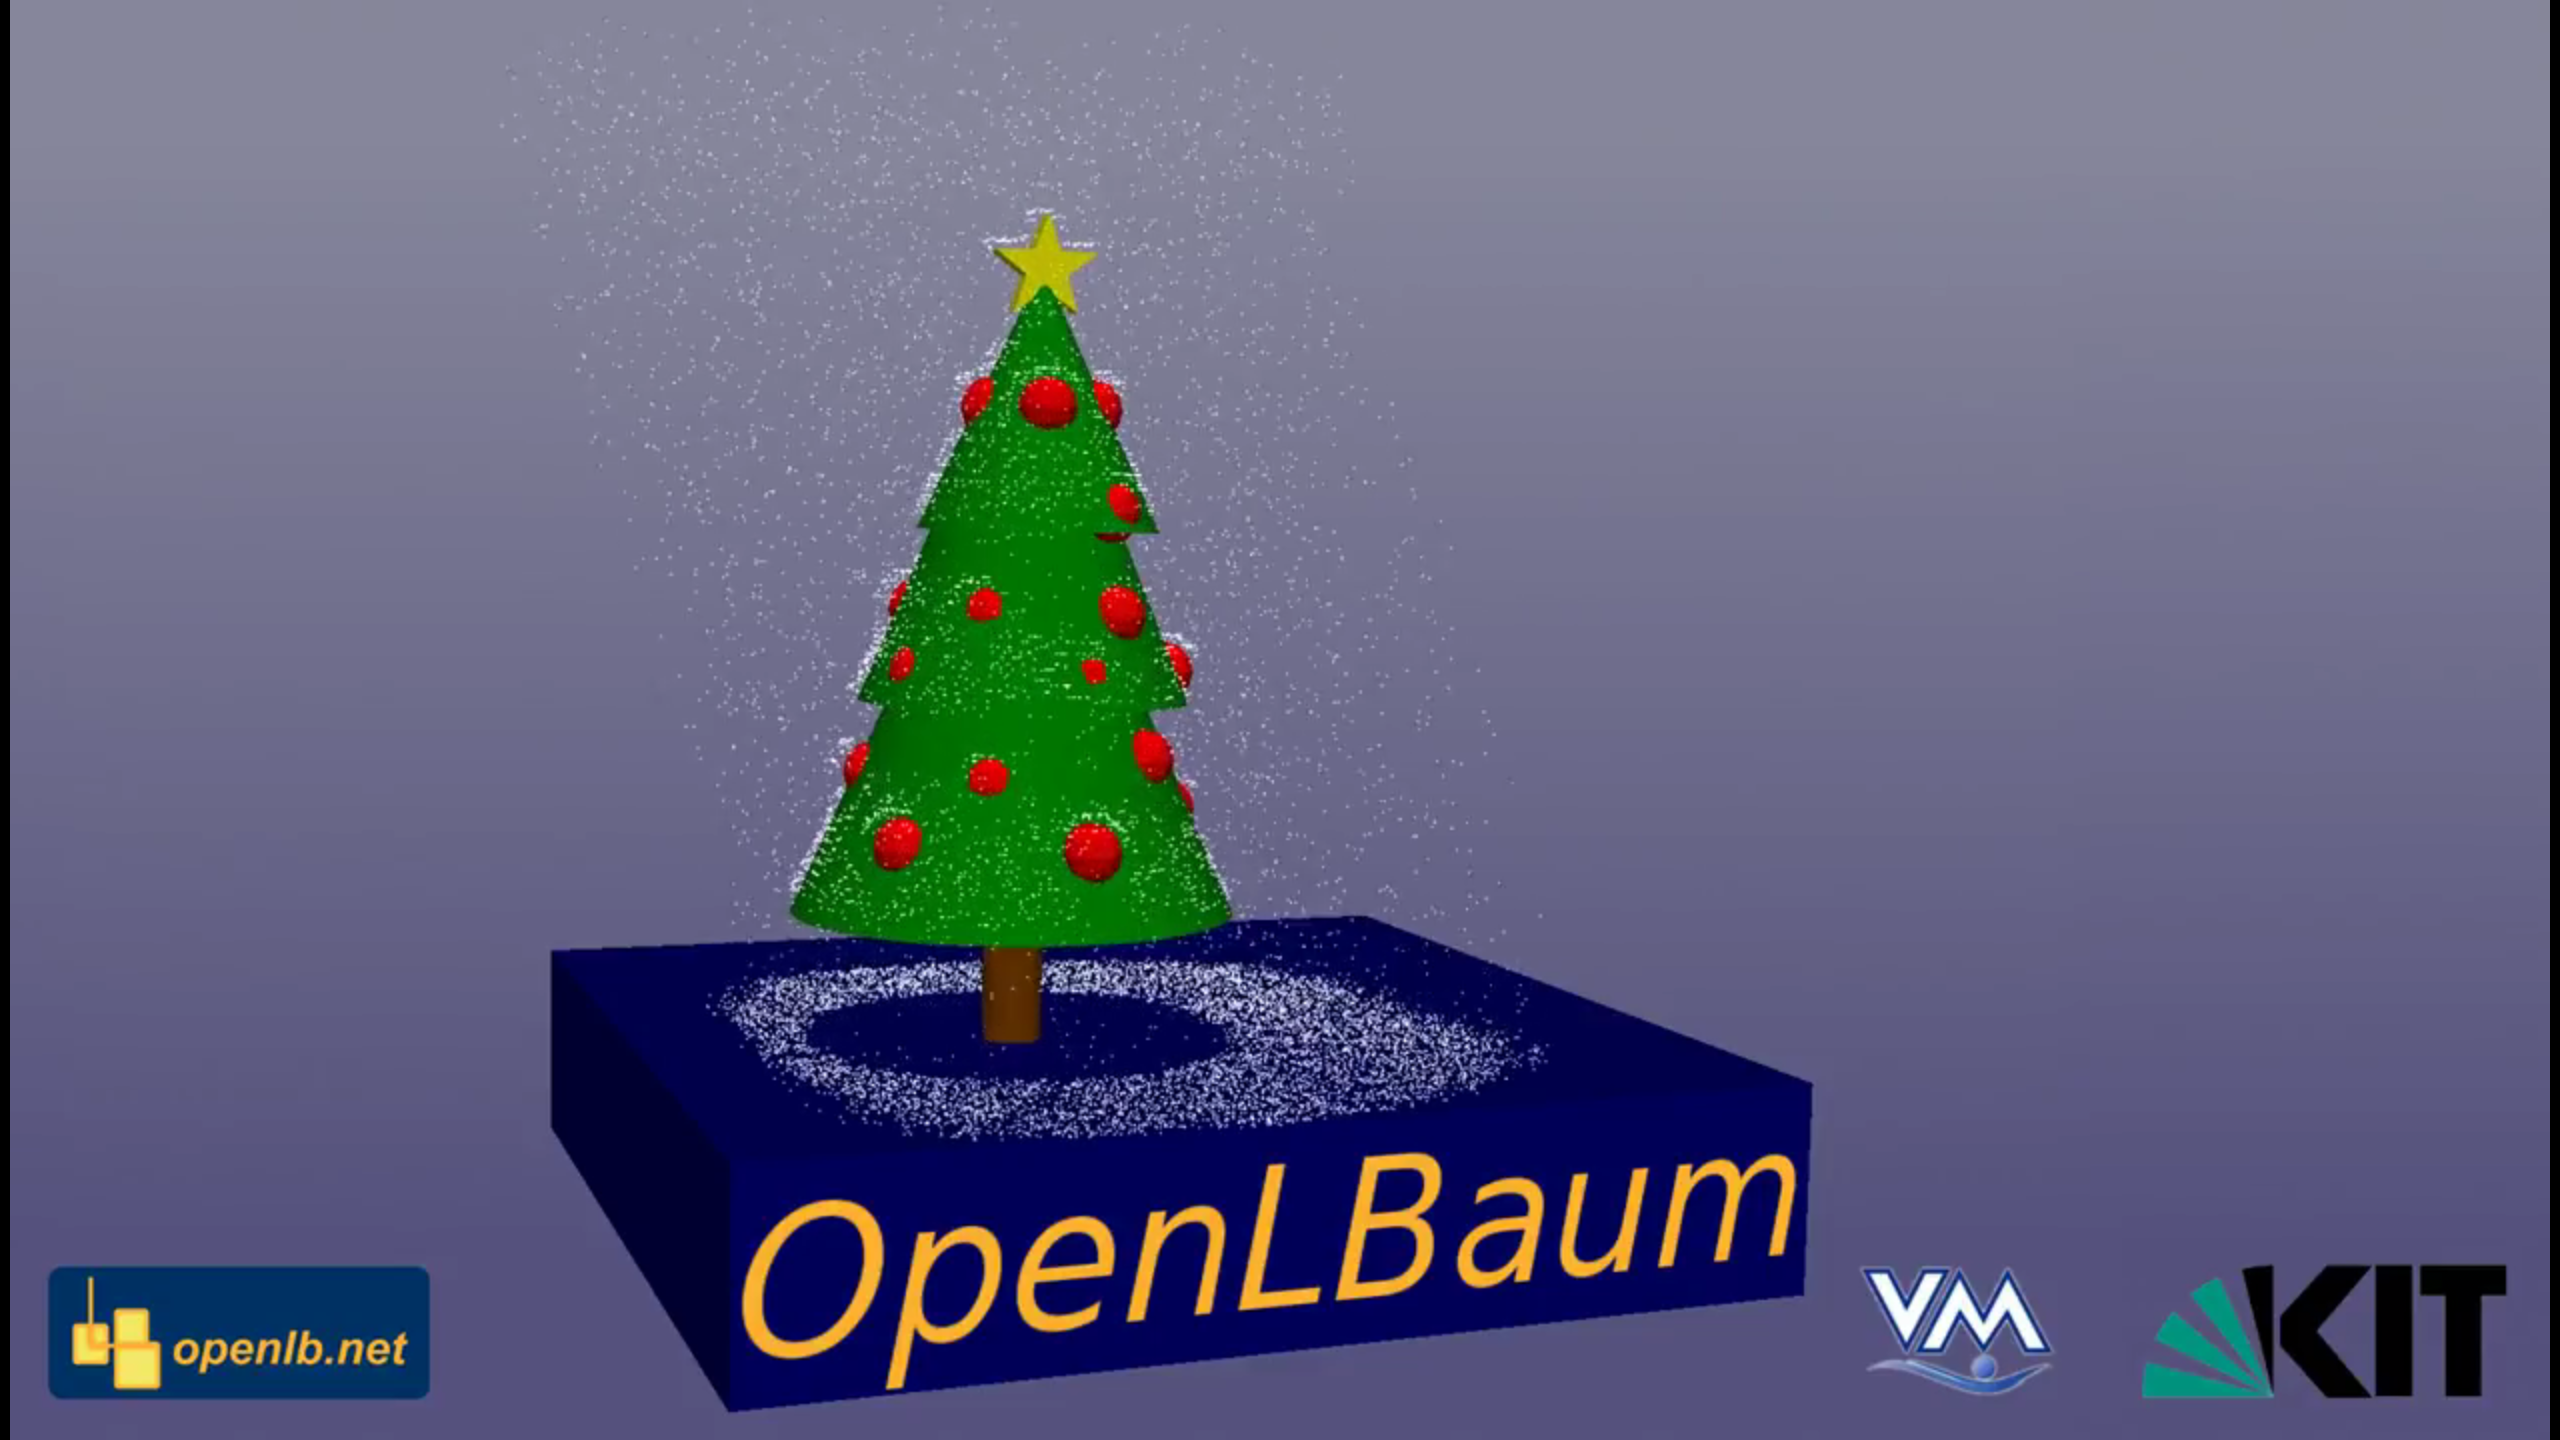 Magic OpenLBaum